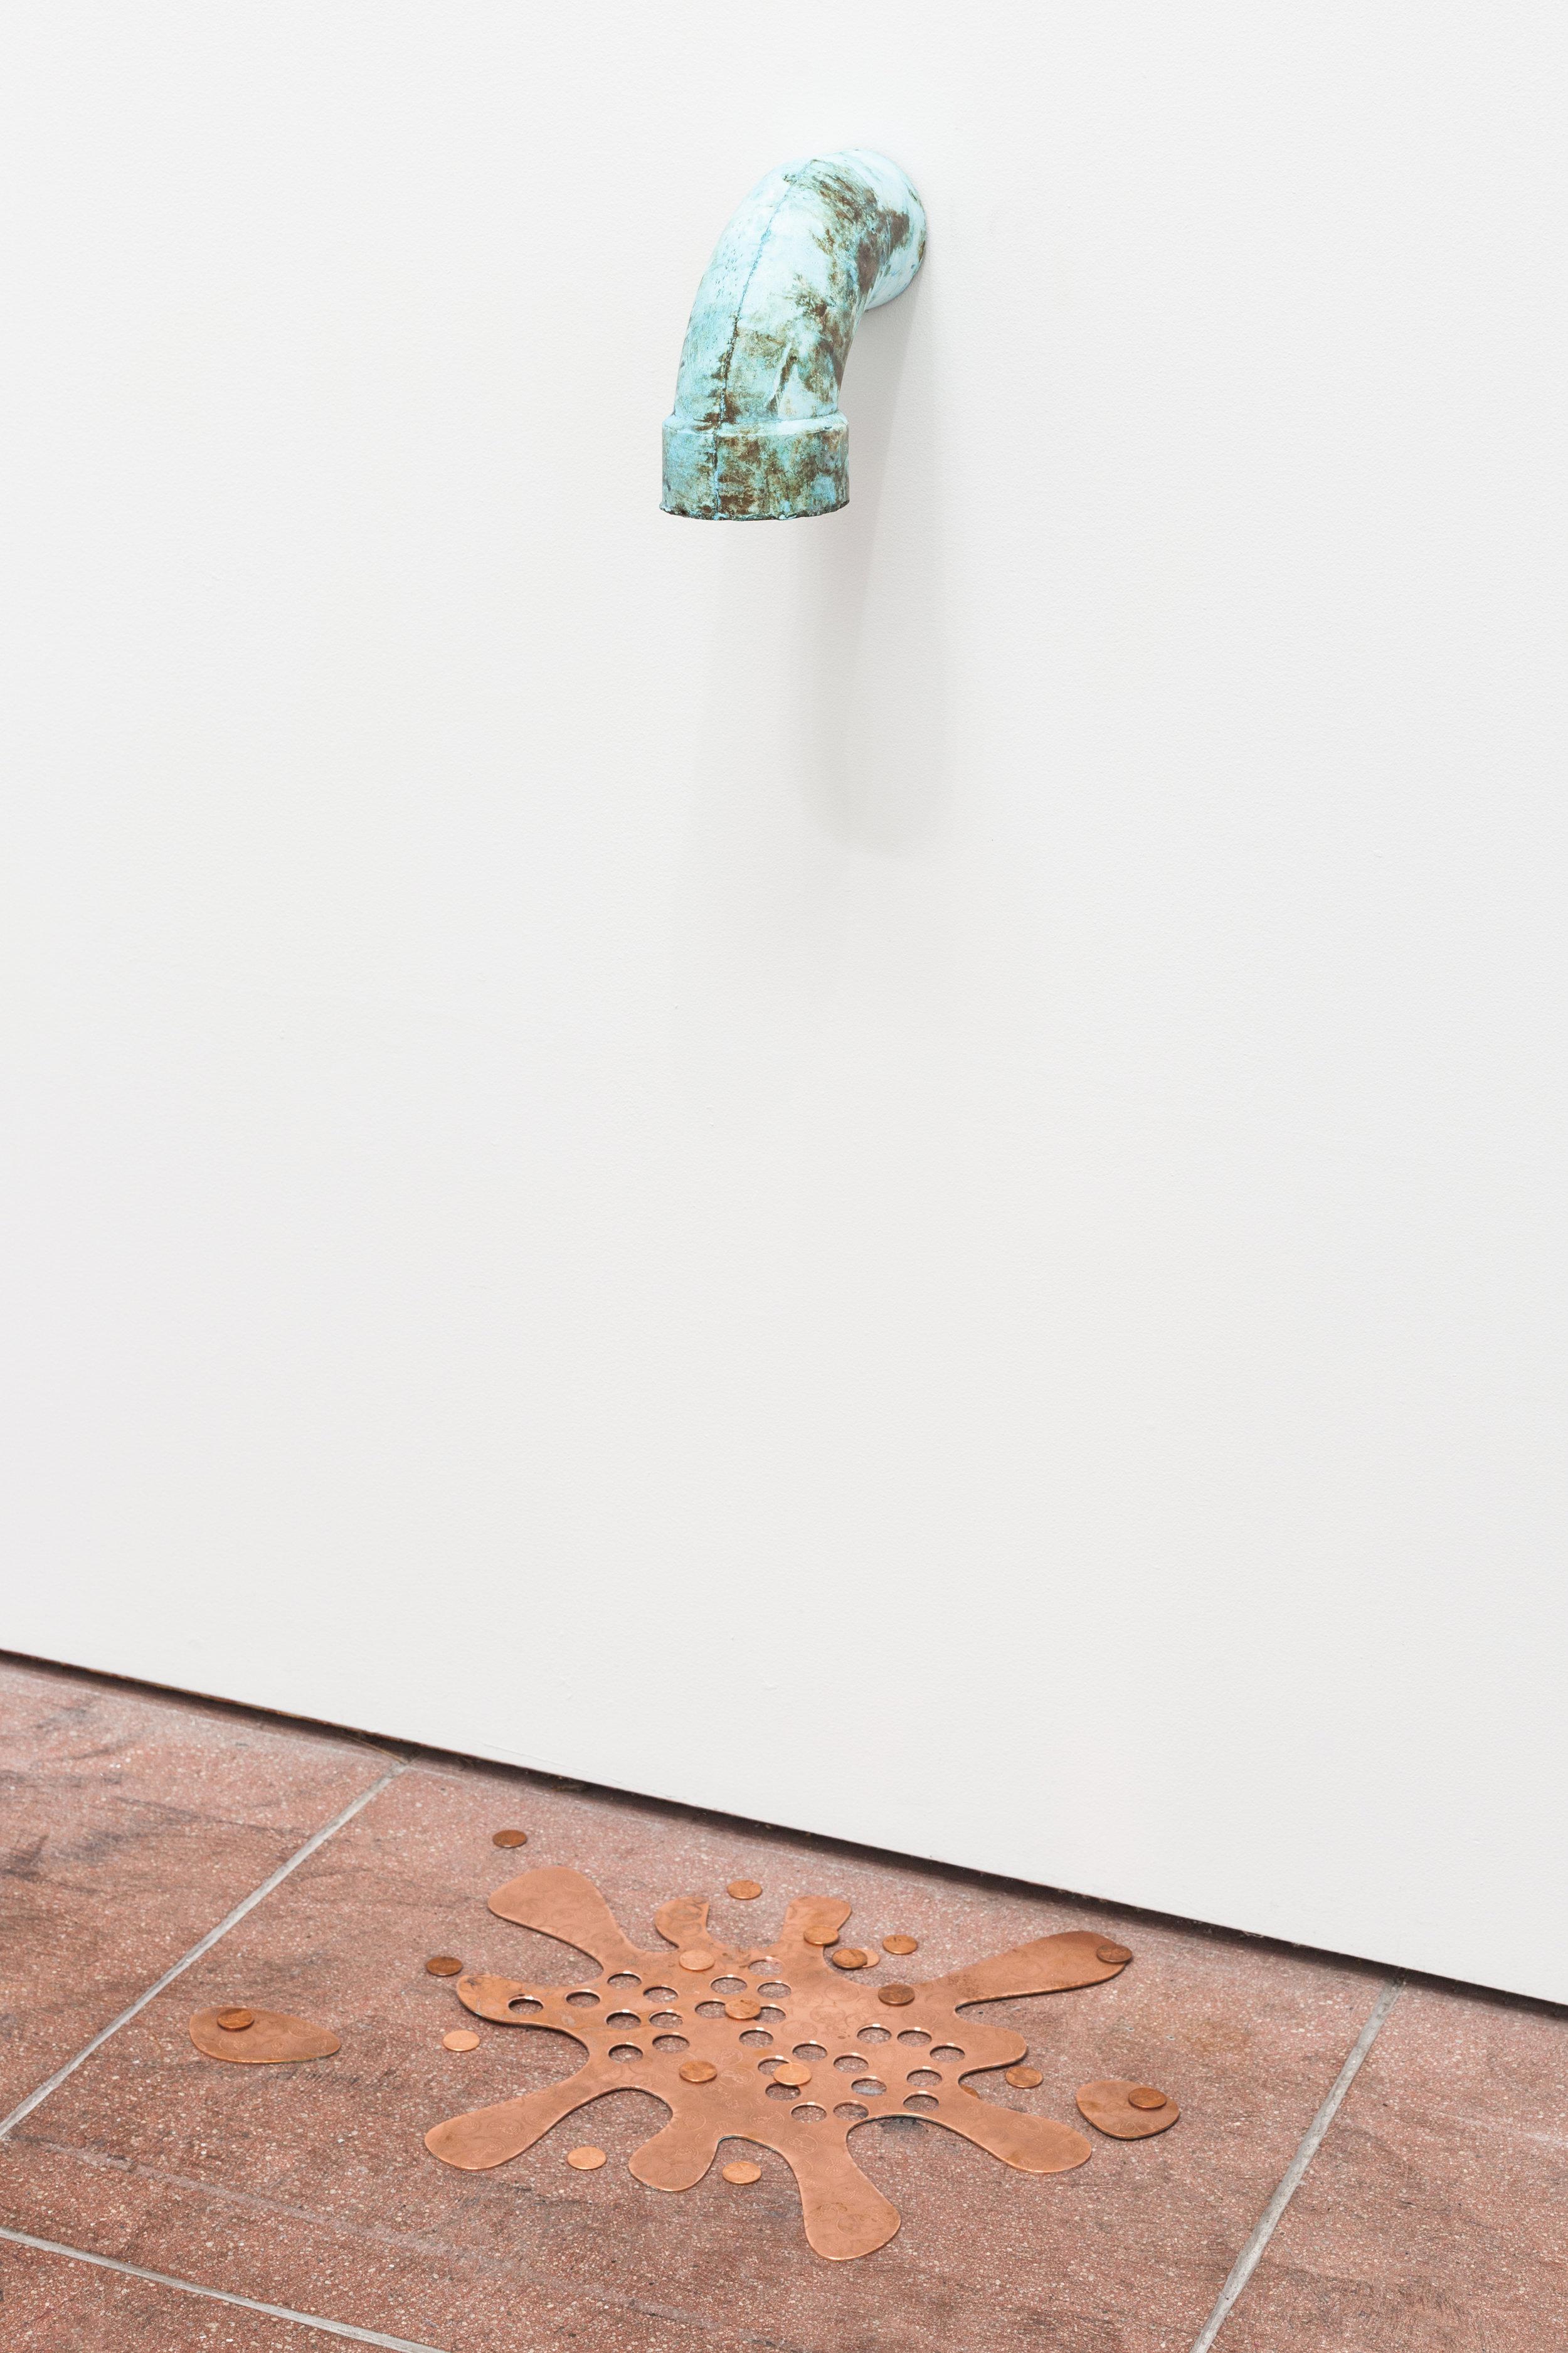 Jory Rabinovitz ,   Love Splat (Copper) , 2019, Tabby, verdigris pigment, melted copper pennies, Dimensions variable